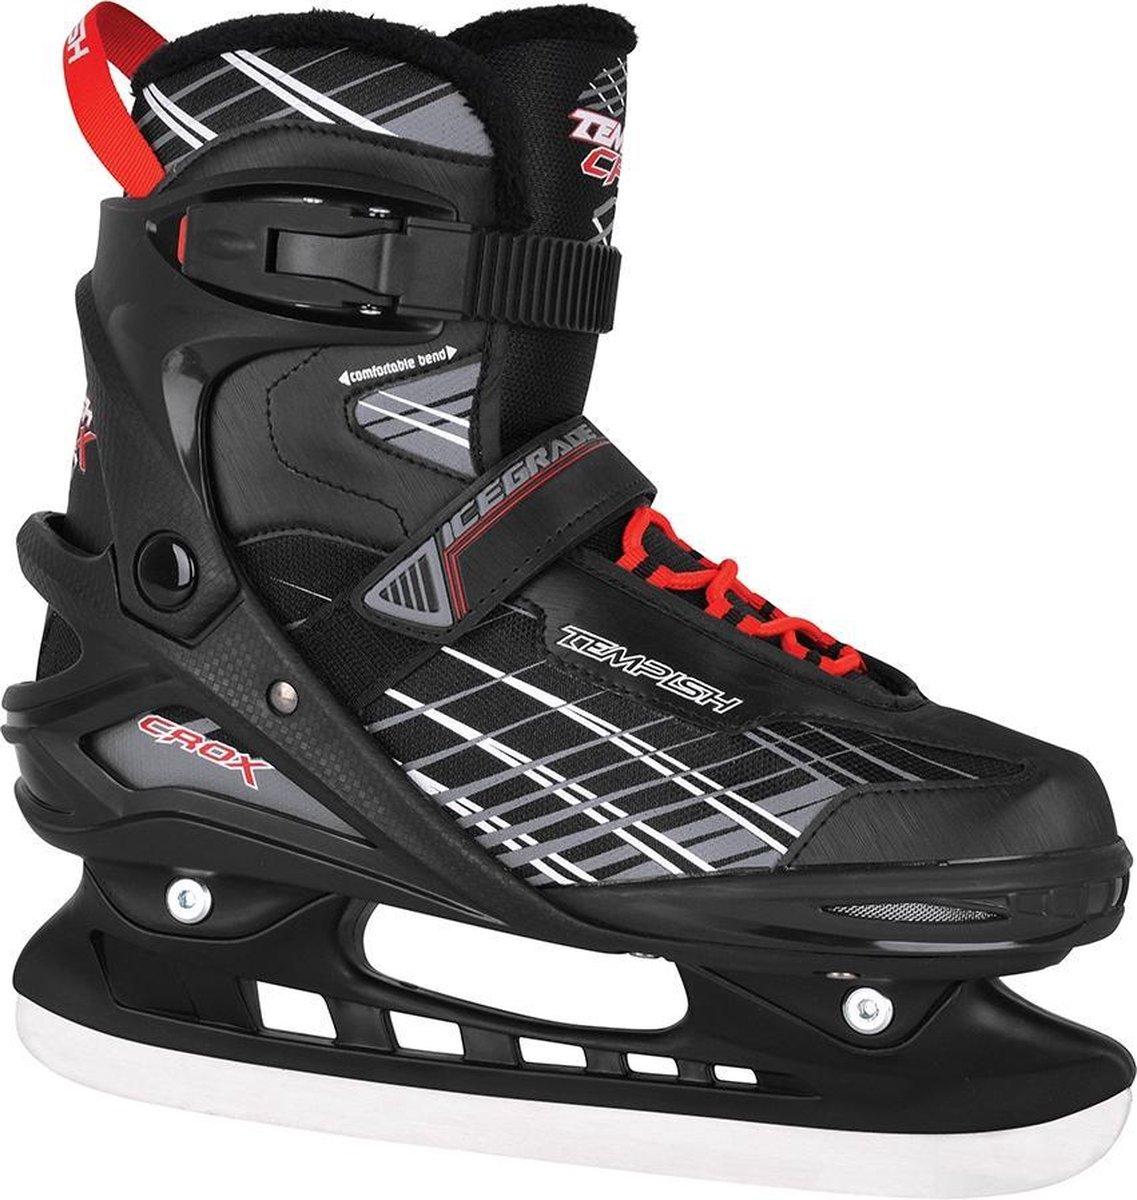 Tempish IJshockeyschaatsen CROX Zwart/Rood 45